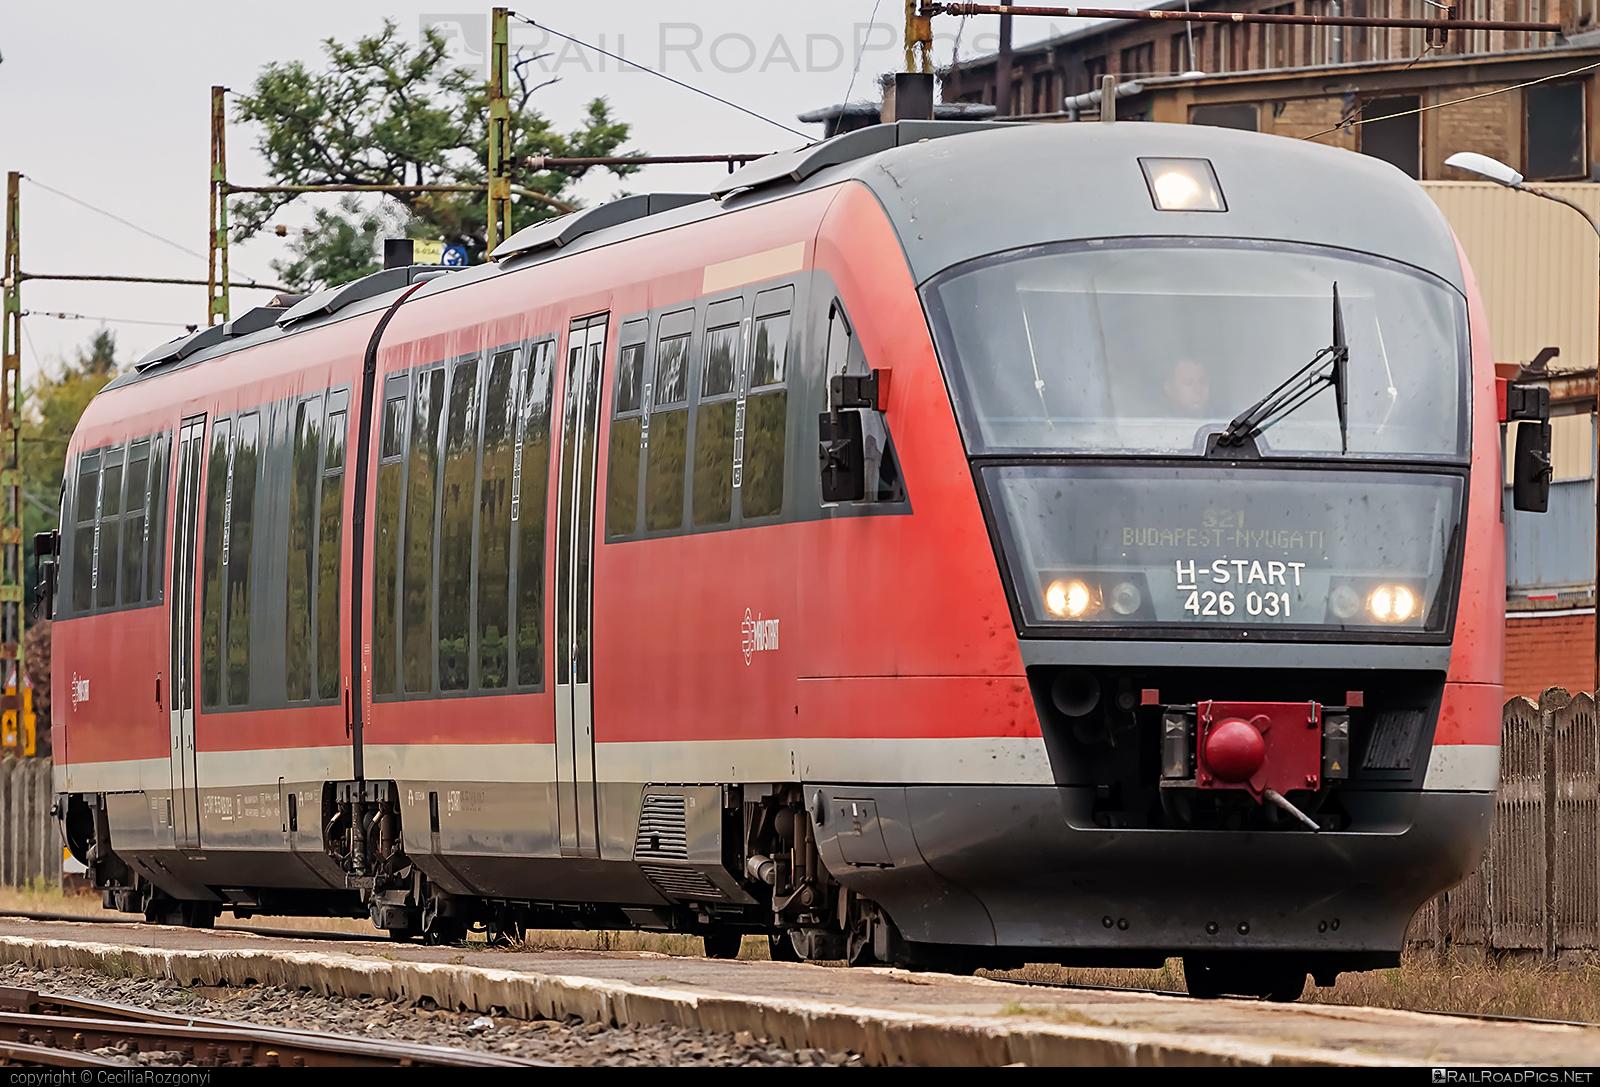 Siemens Desiro Classic - 426 031 operated by MÁV-START ZRt. #desiro #desiroclassic #mavstart #mavstartzrt #siemens #siemensdesiro #siemensdesiroclassic